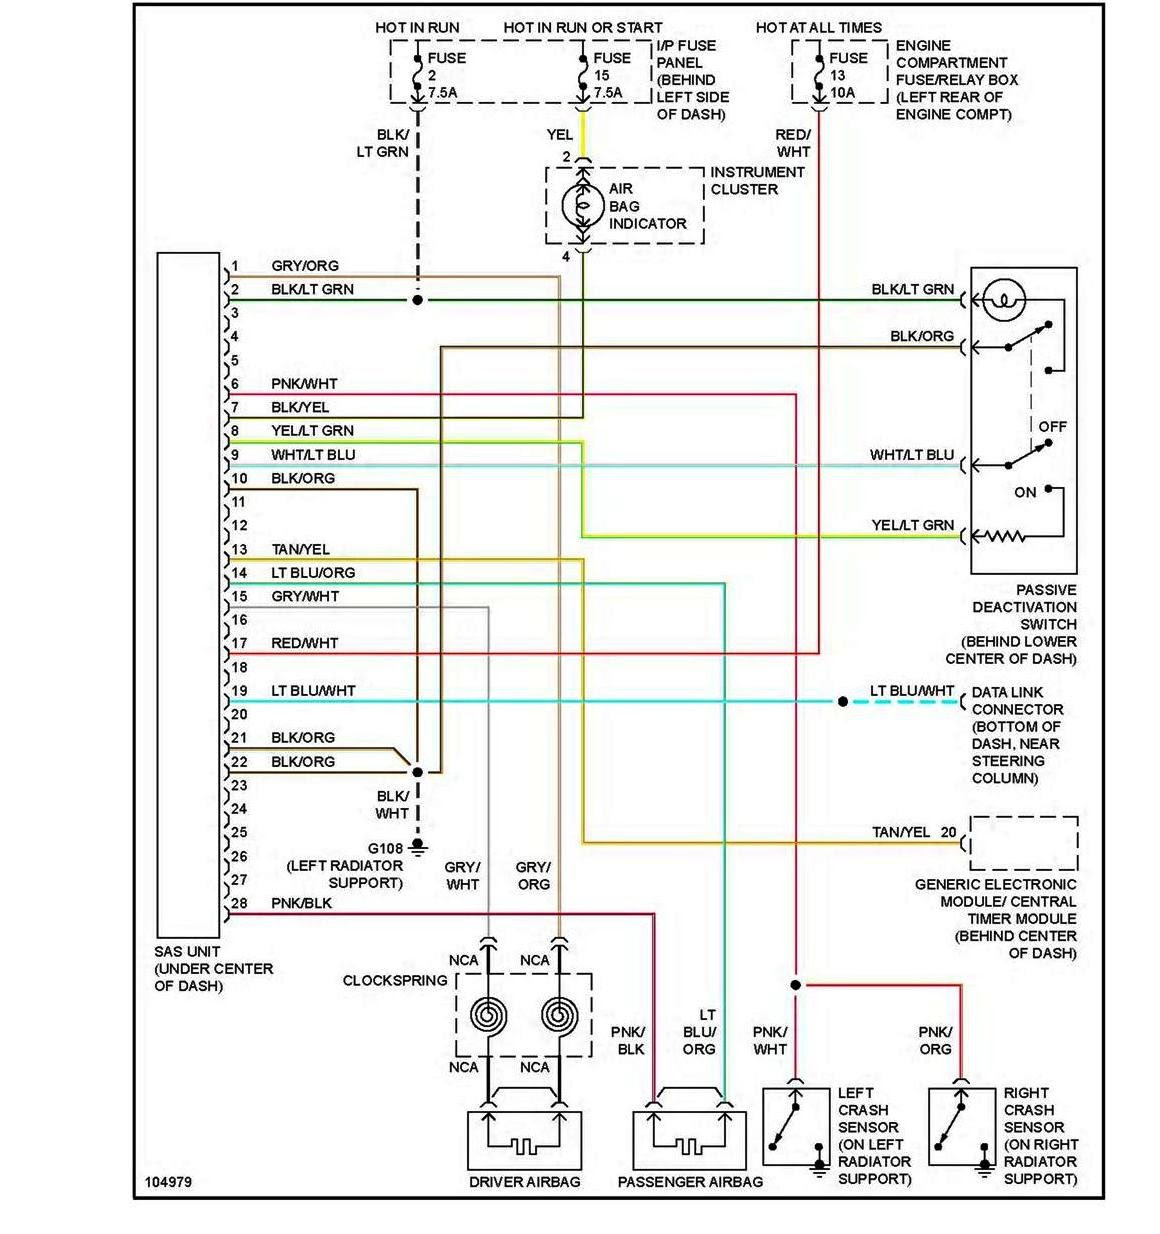 Wiring Diagram For 1998 Mazda Wiring Diagram Schematic Year Visit Year Visit Aliceviola It